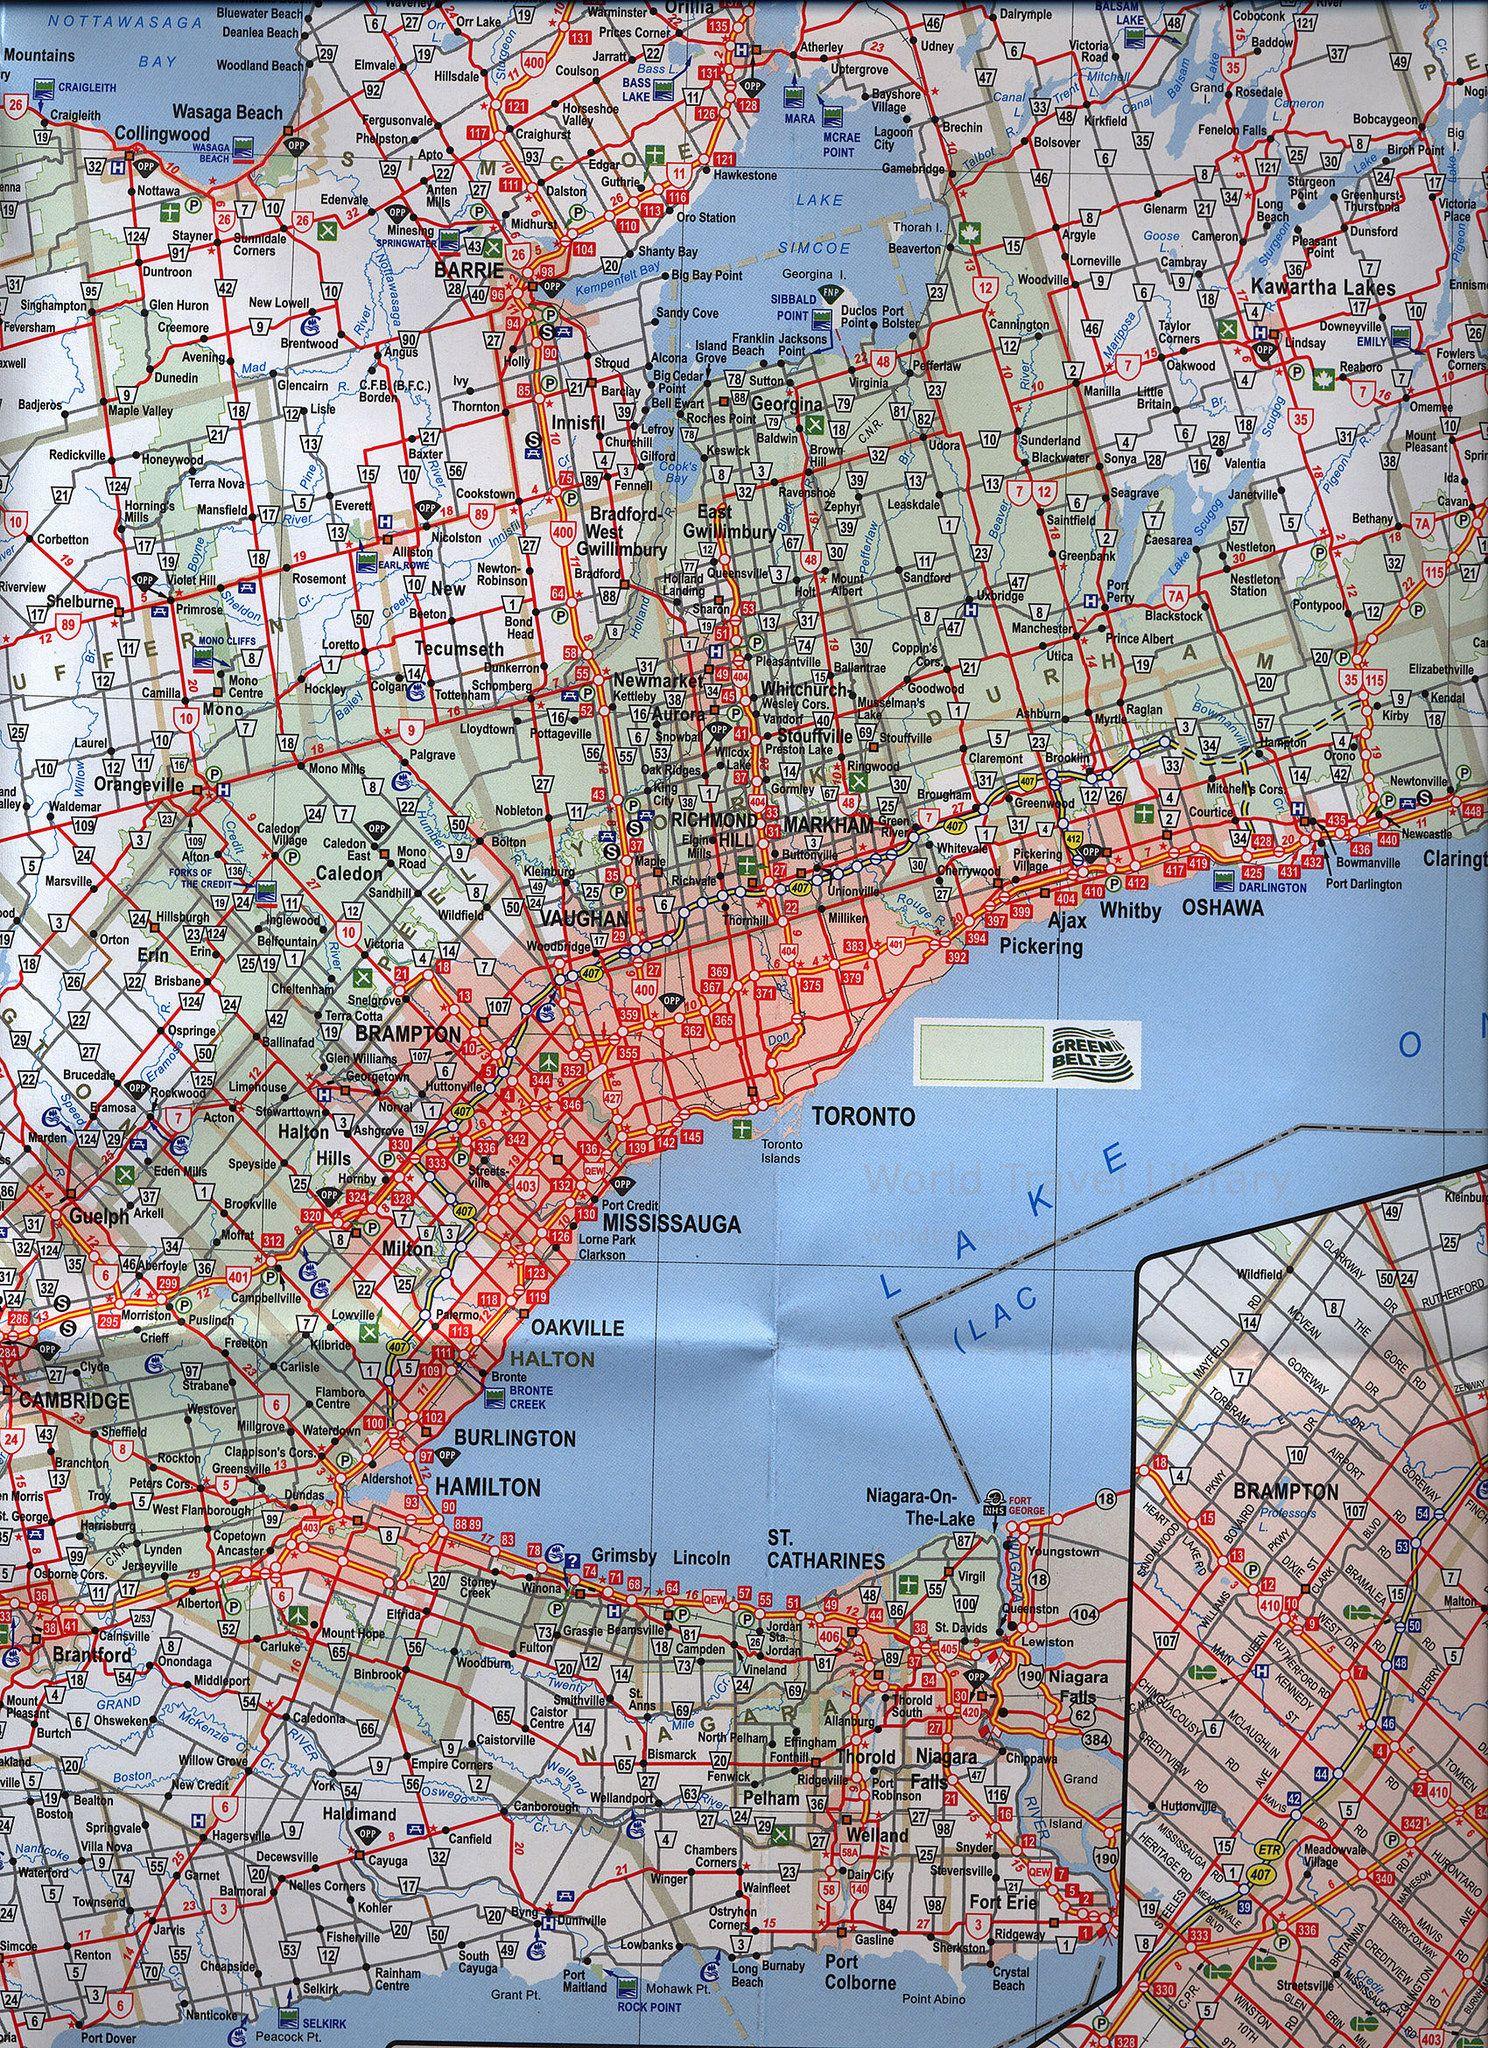 Ontario Canada Official Road Map Carte Routiere - Map of ontario canada